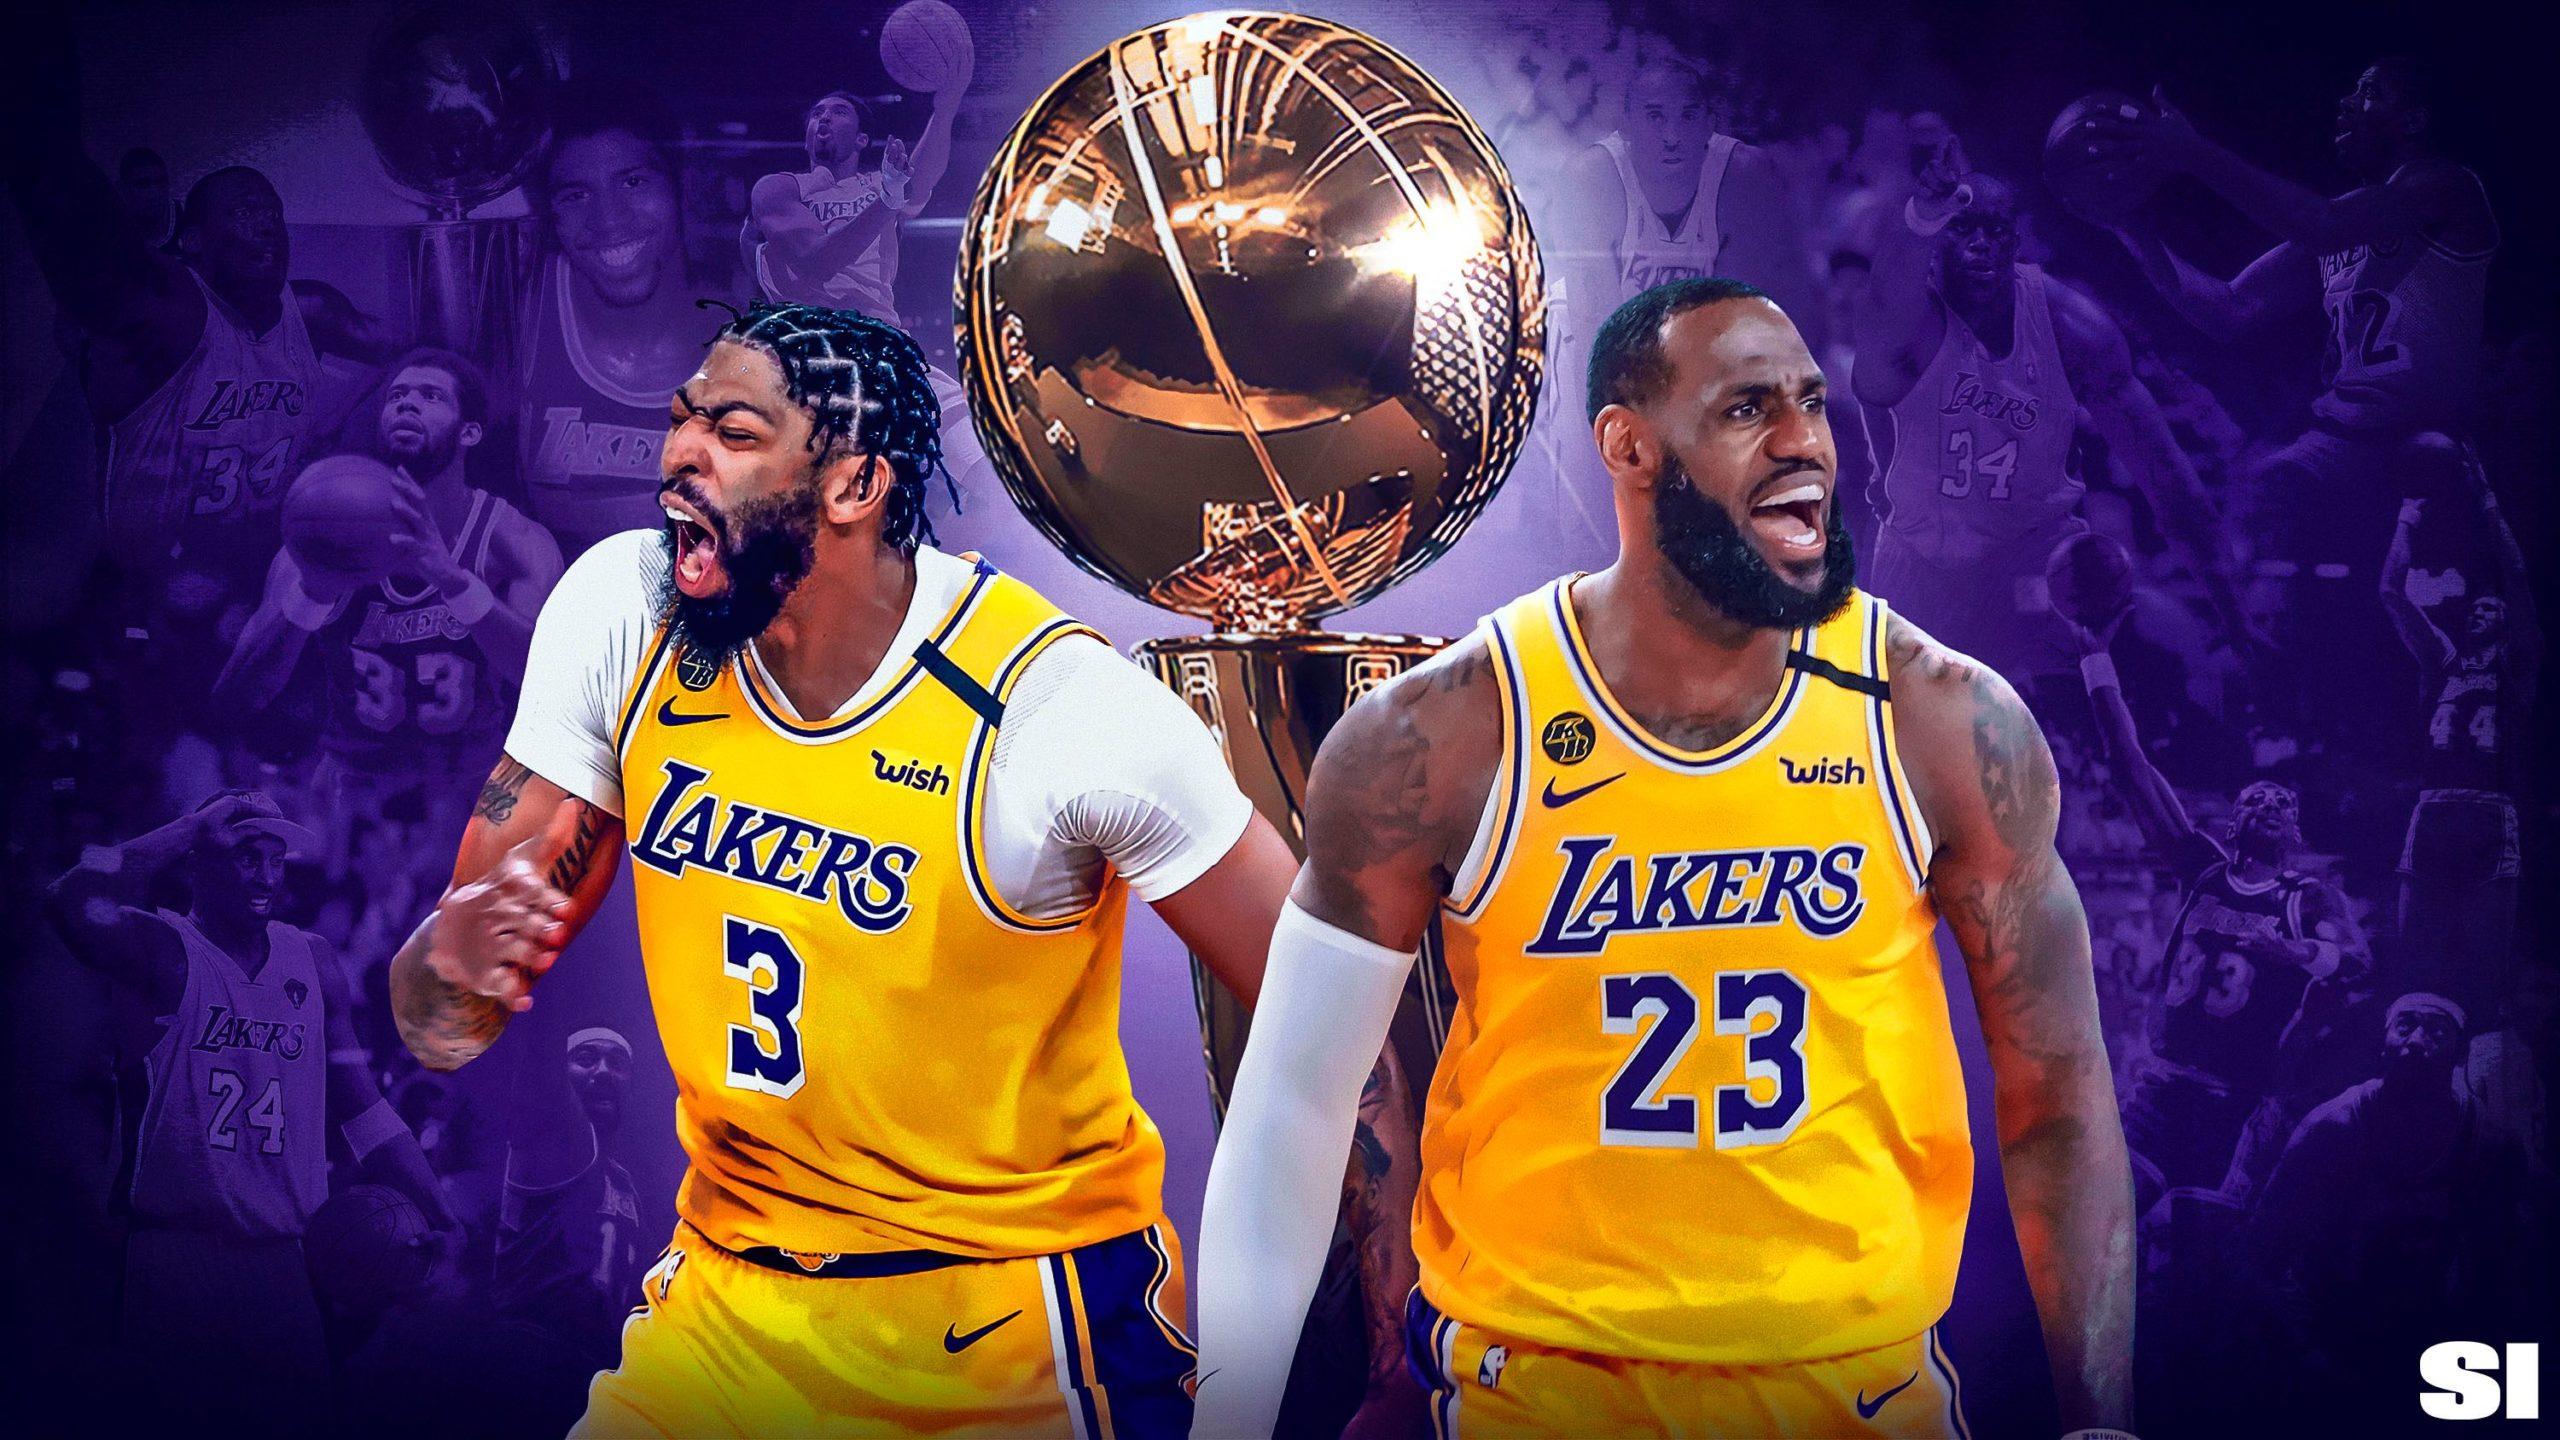 Los Angeles Lakers NBA Champions Wallpapers • TrumpWallpapers